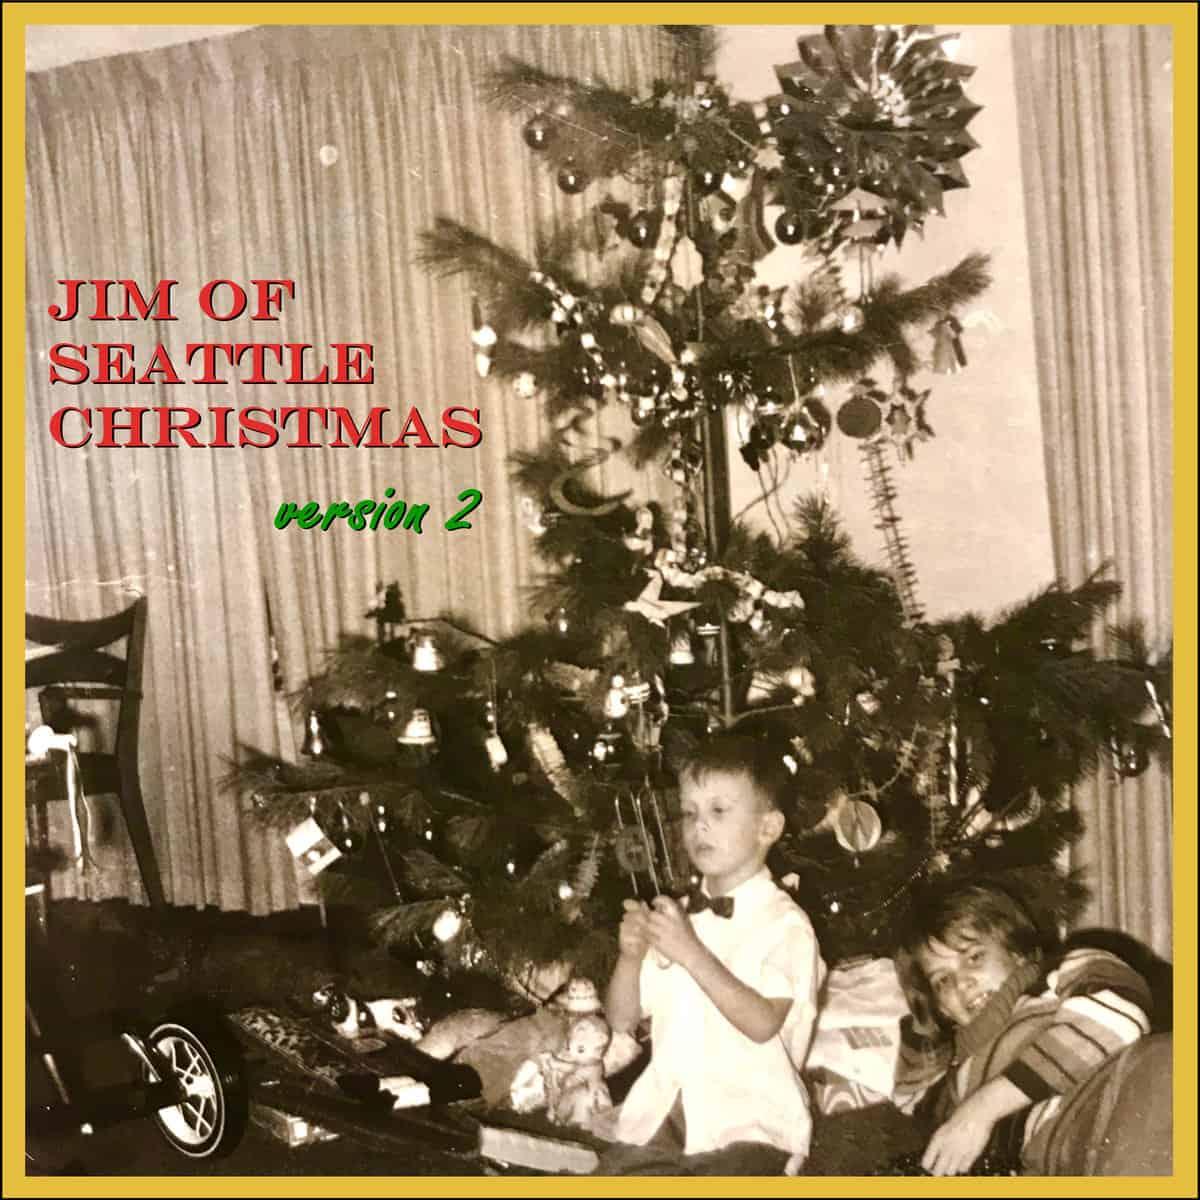 Jim of Seattle Has Holiday Love 4 U!